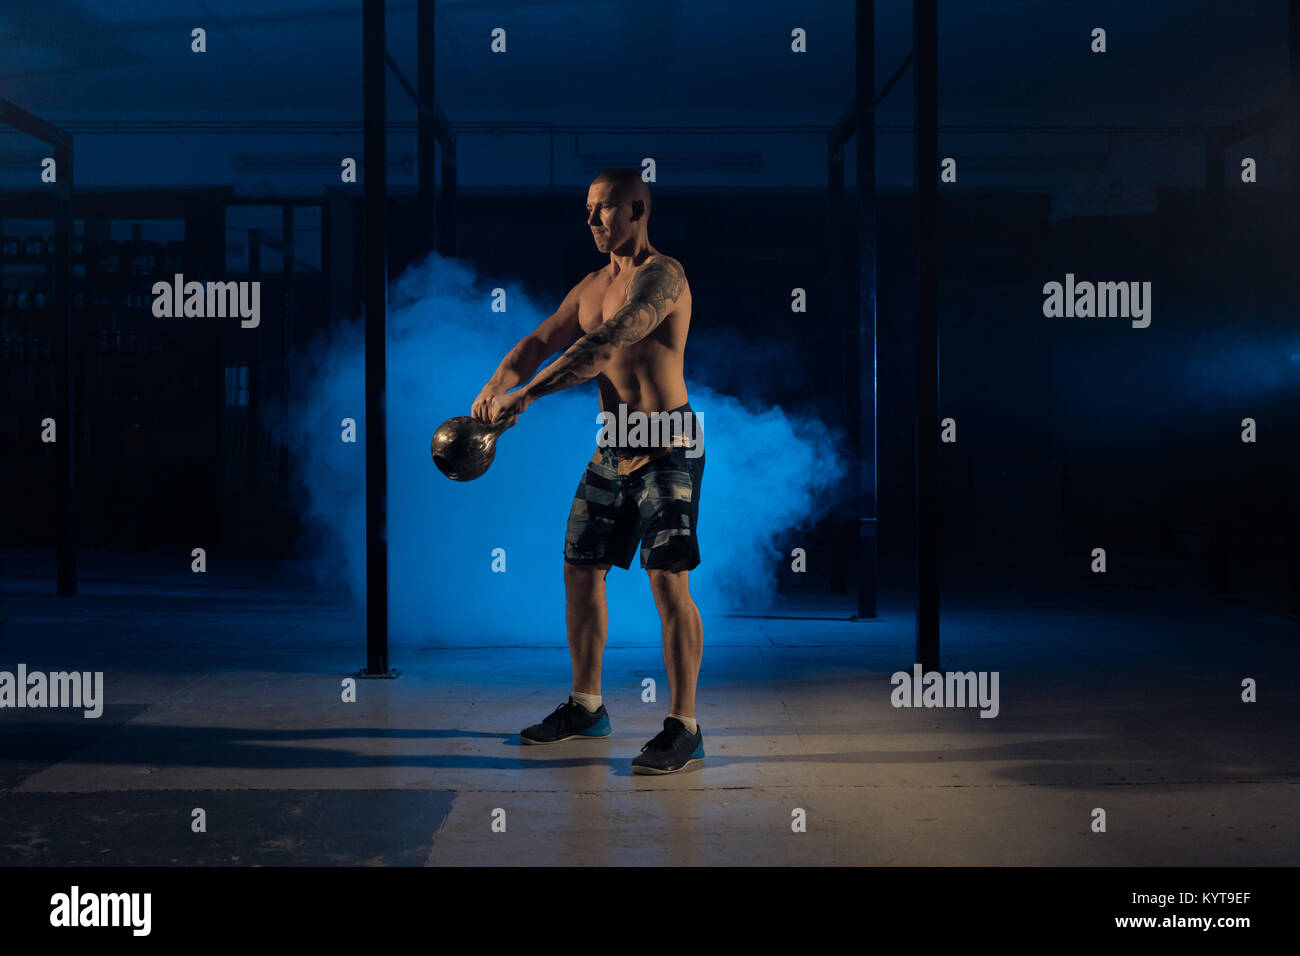 Athletics athlete man pulls weight. Weight-lifting - Stock Image